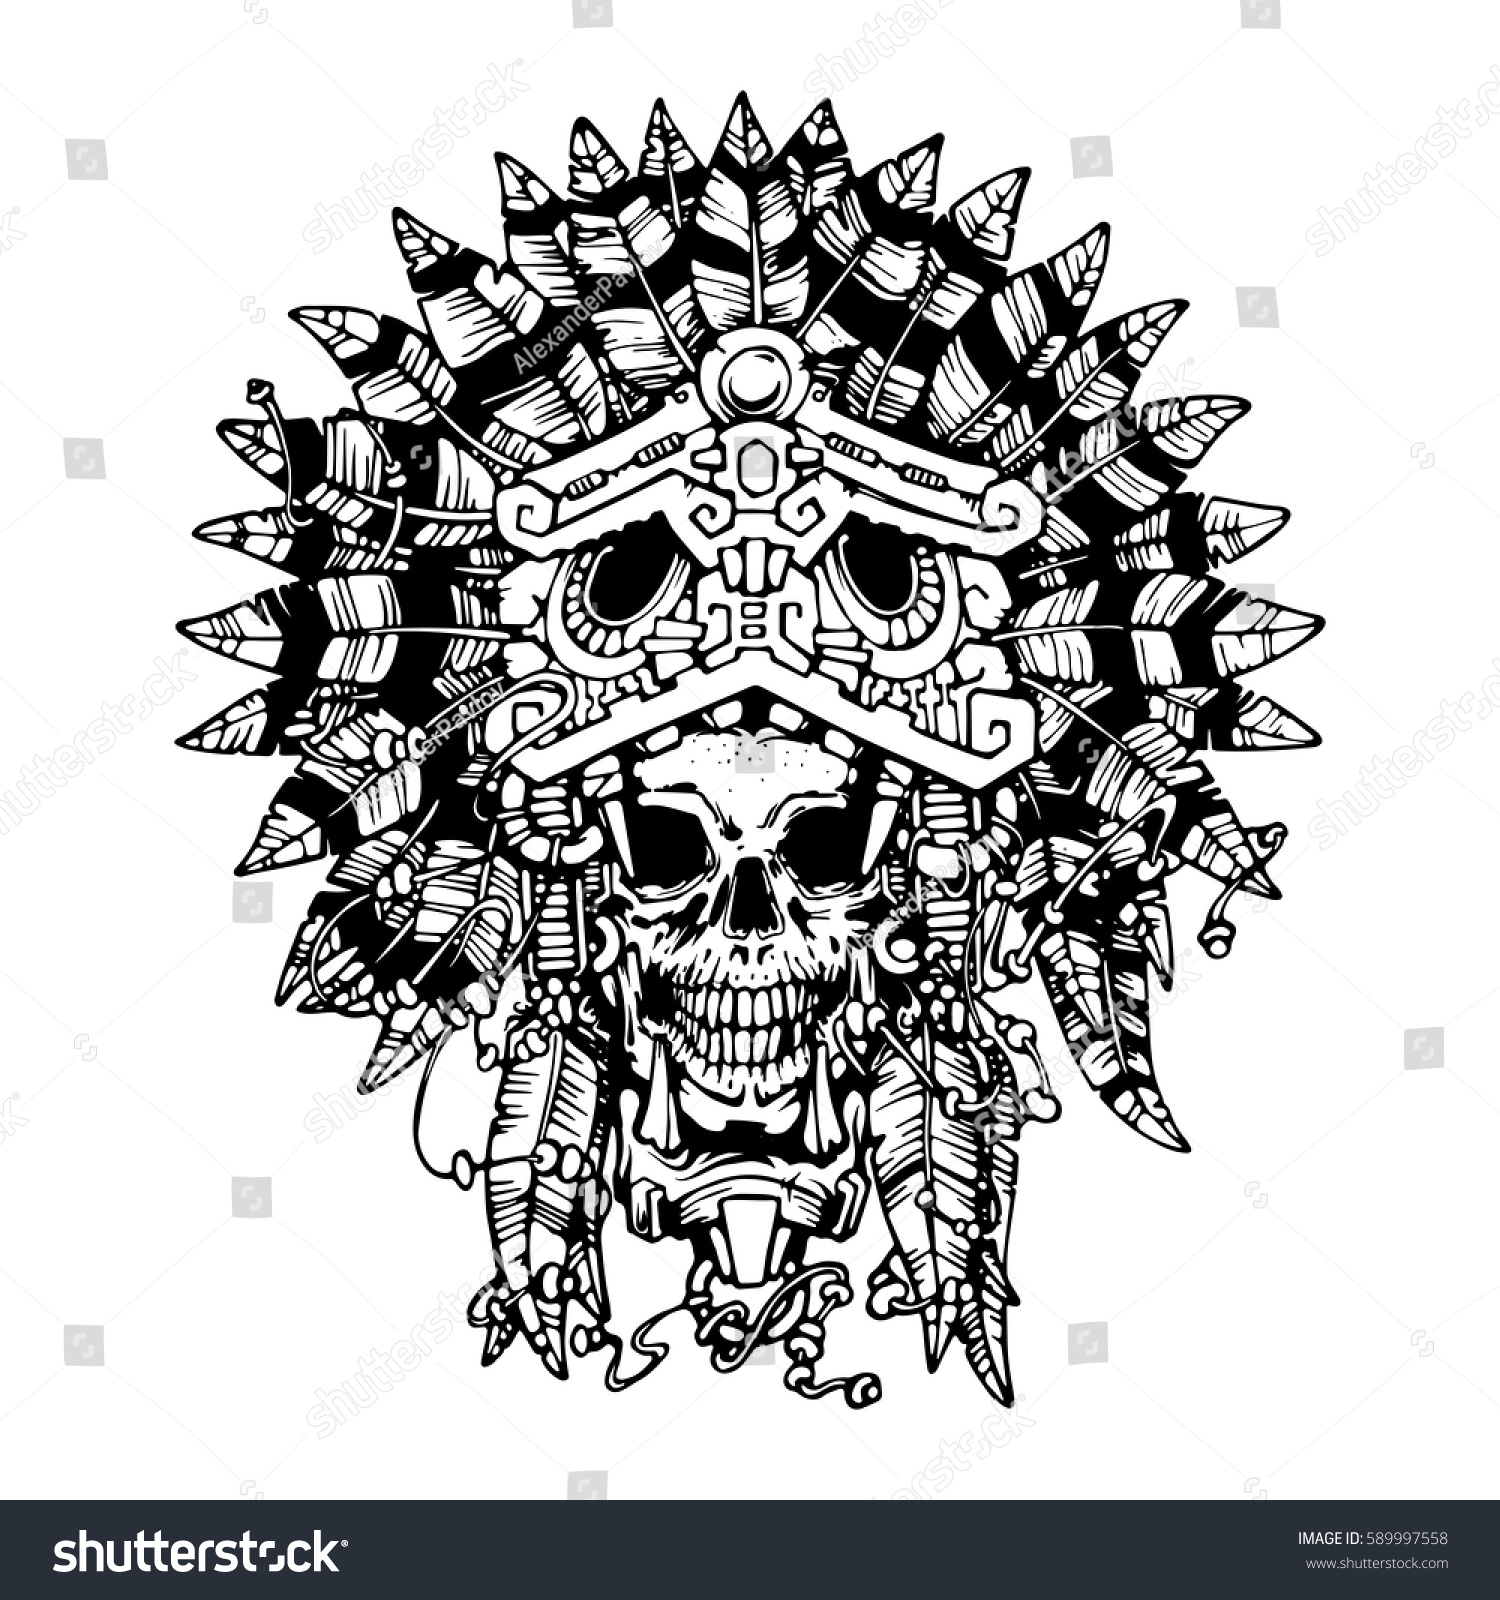 Aztec jaguar warrior tattoo vector illustration stock for Jaguar warrior tattoo